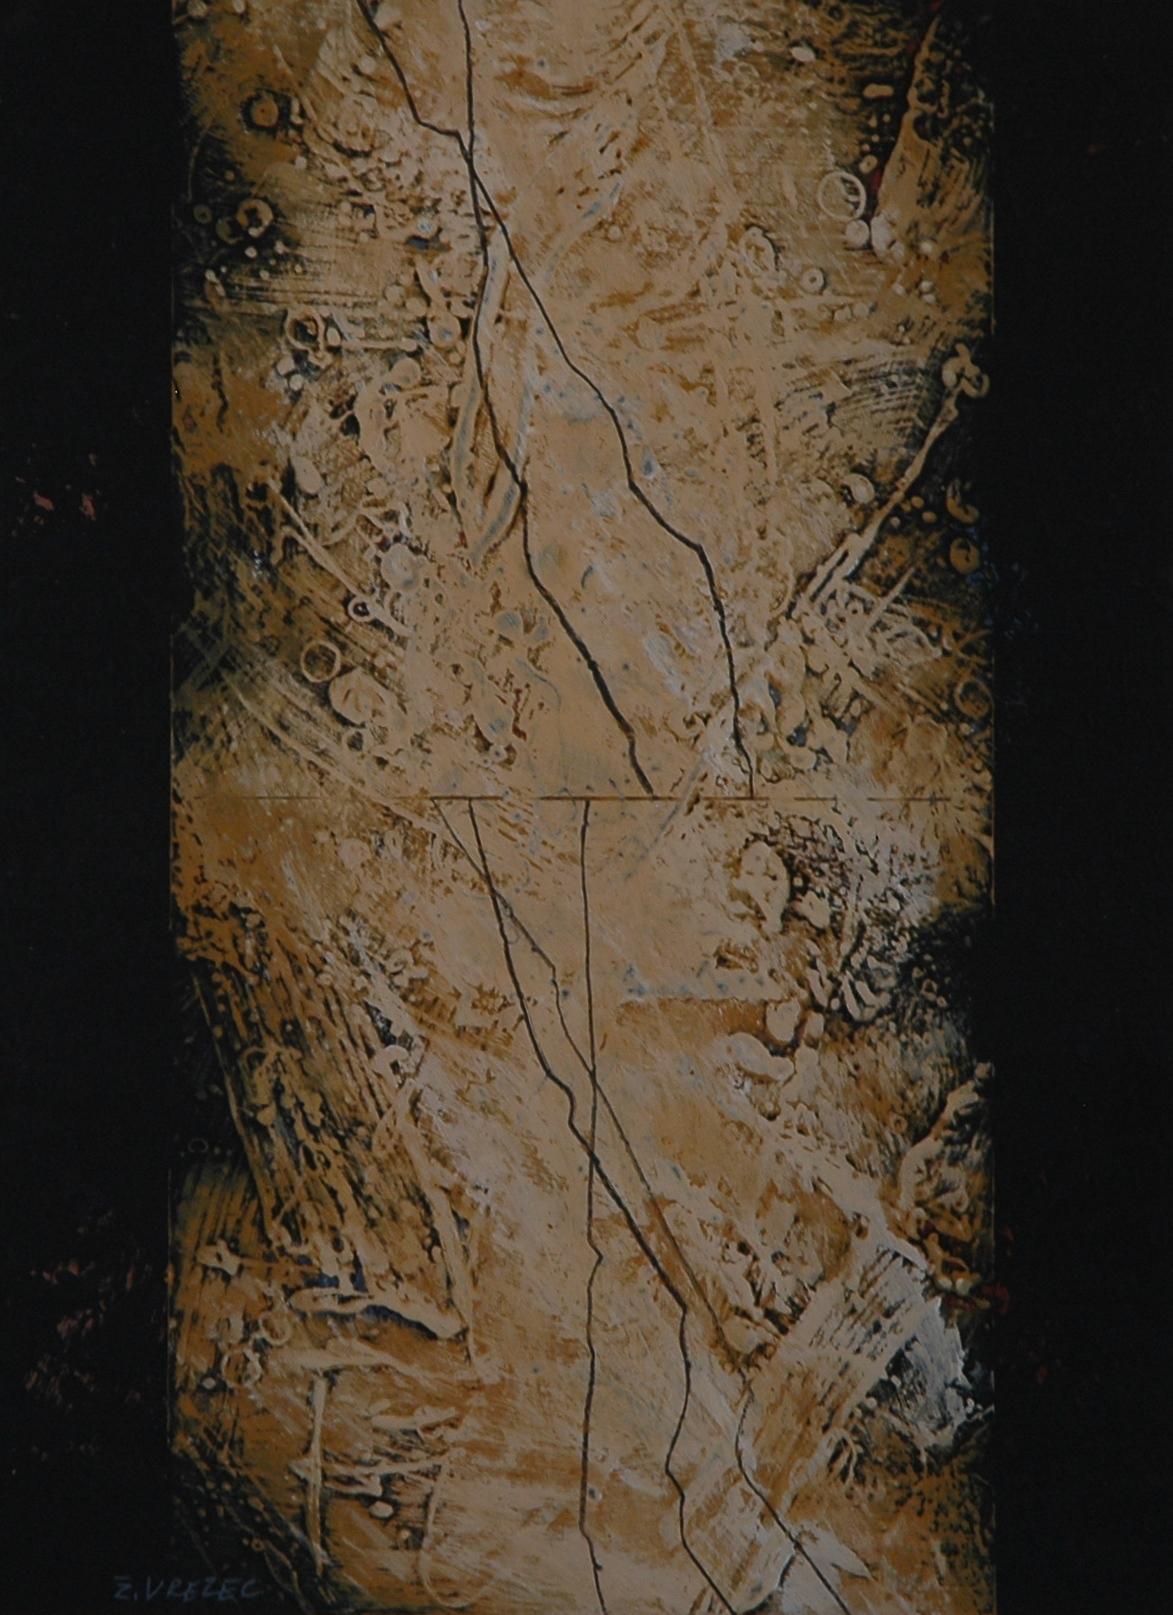 Vrezec Žarko b.n. 9